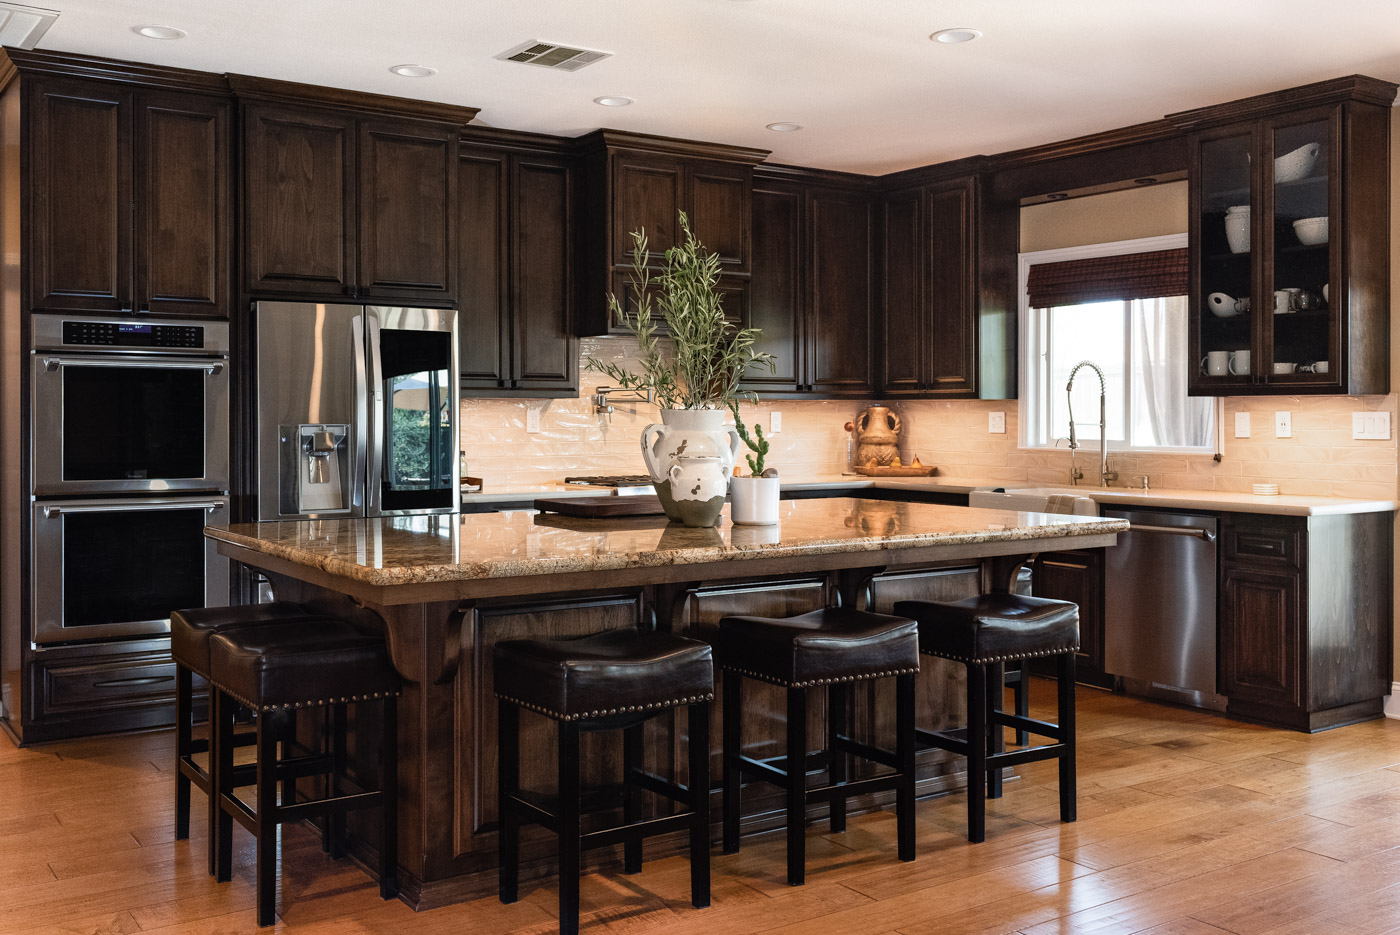 custom kitchen designers charlotte nc traditional mediterranean cabinets in paso robles sligh design 1 jpg